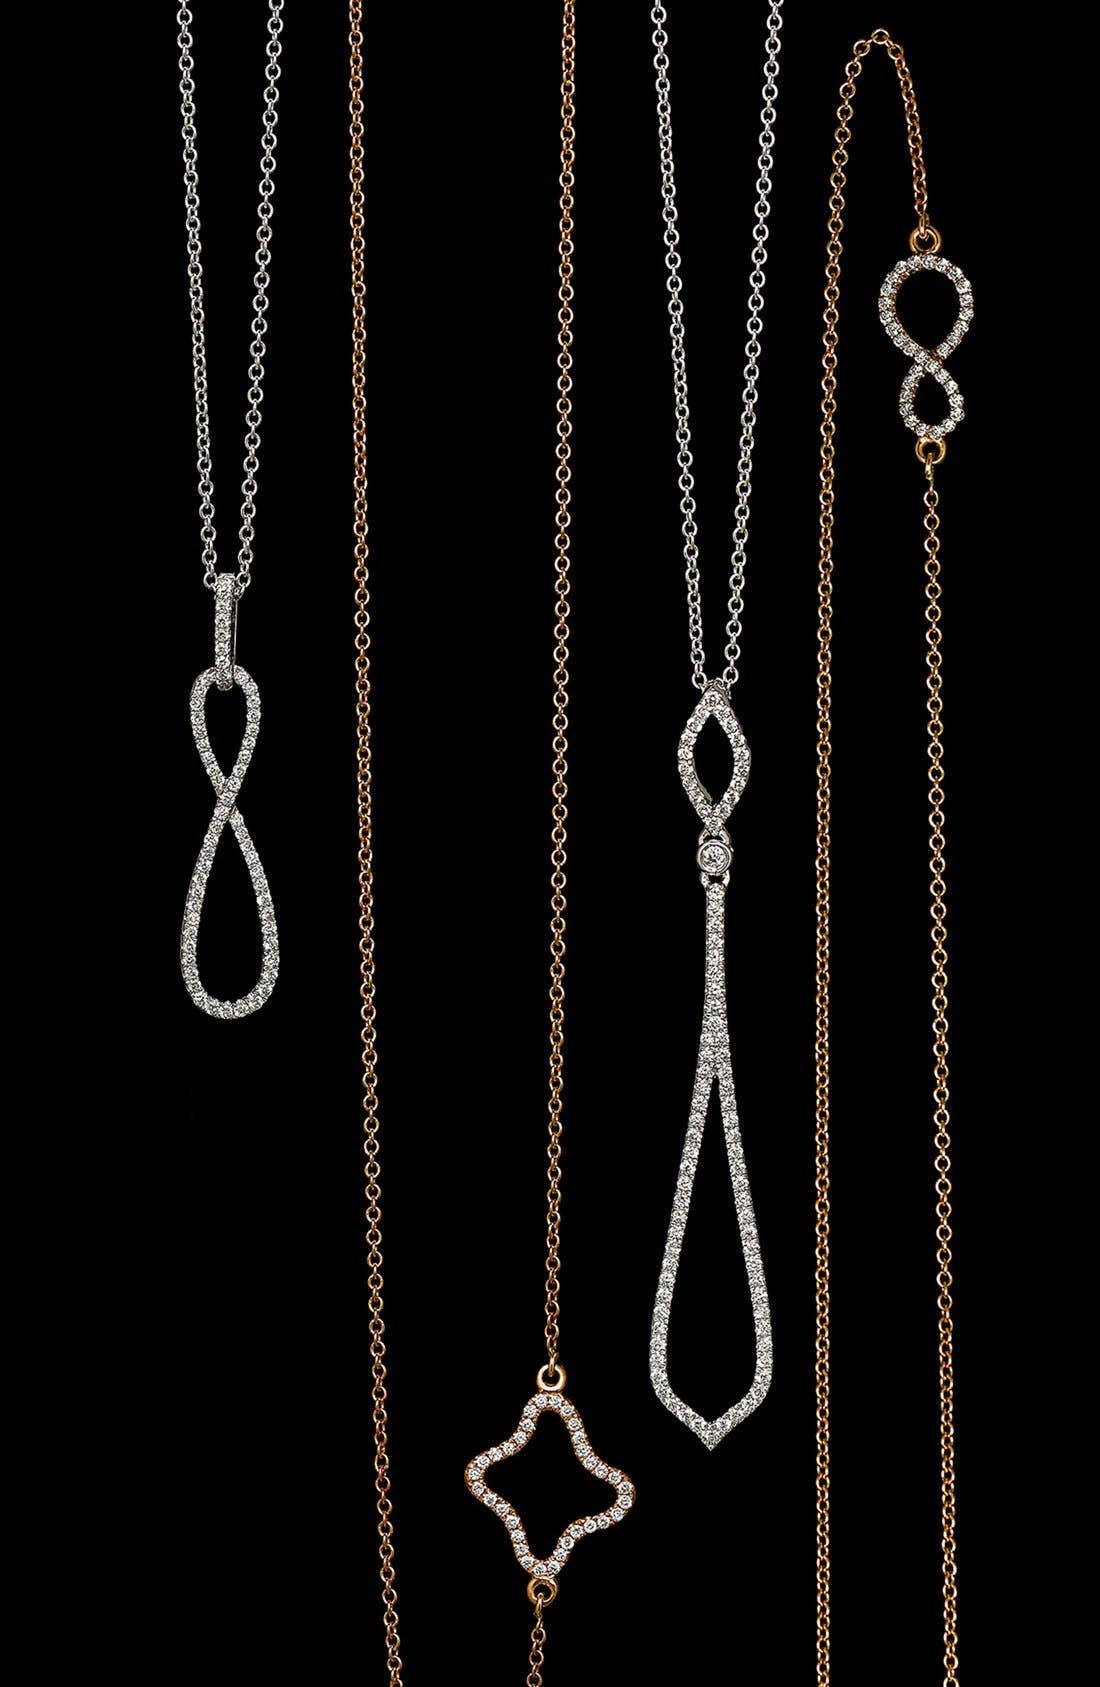 Pavé Diamond Sideways Infinity Symbol Pendant Necklace,                             Alternate thumbnail 3, color,                             710